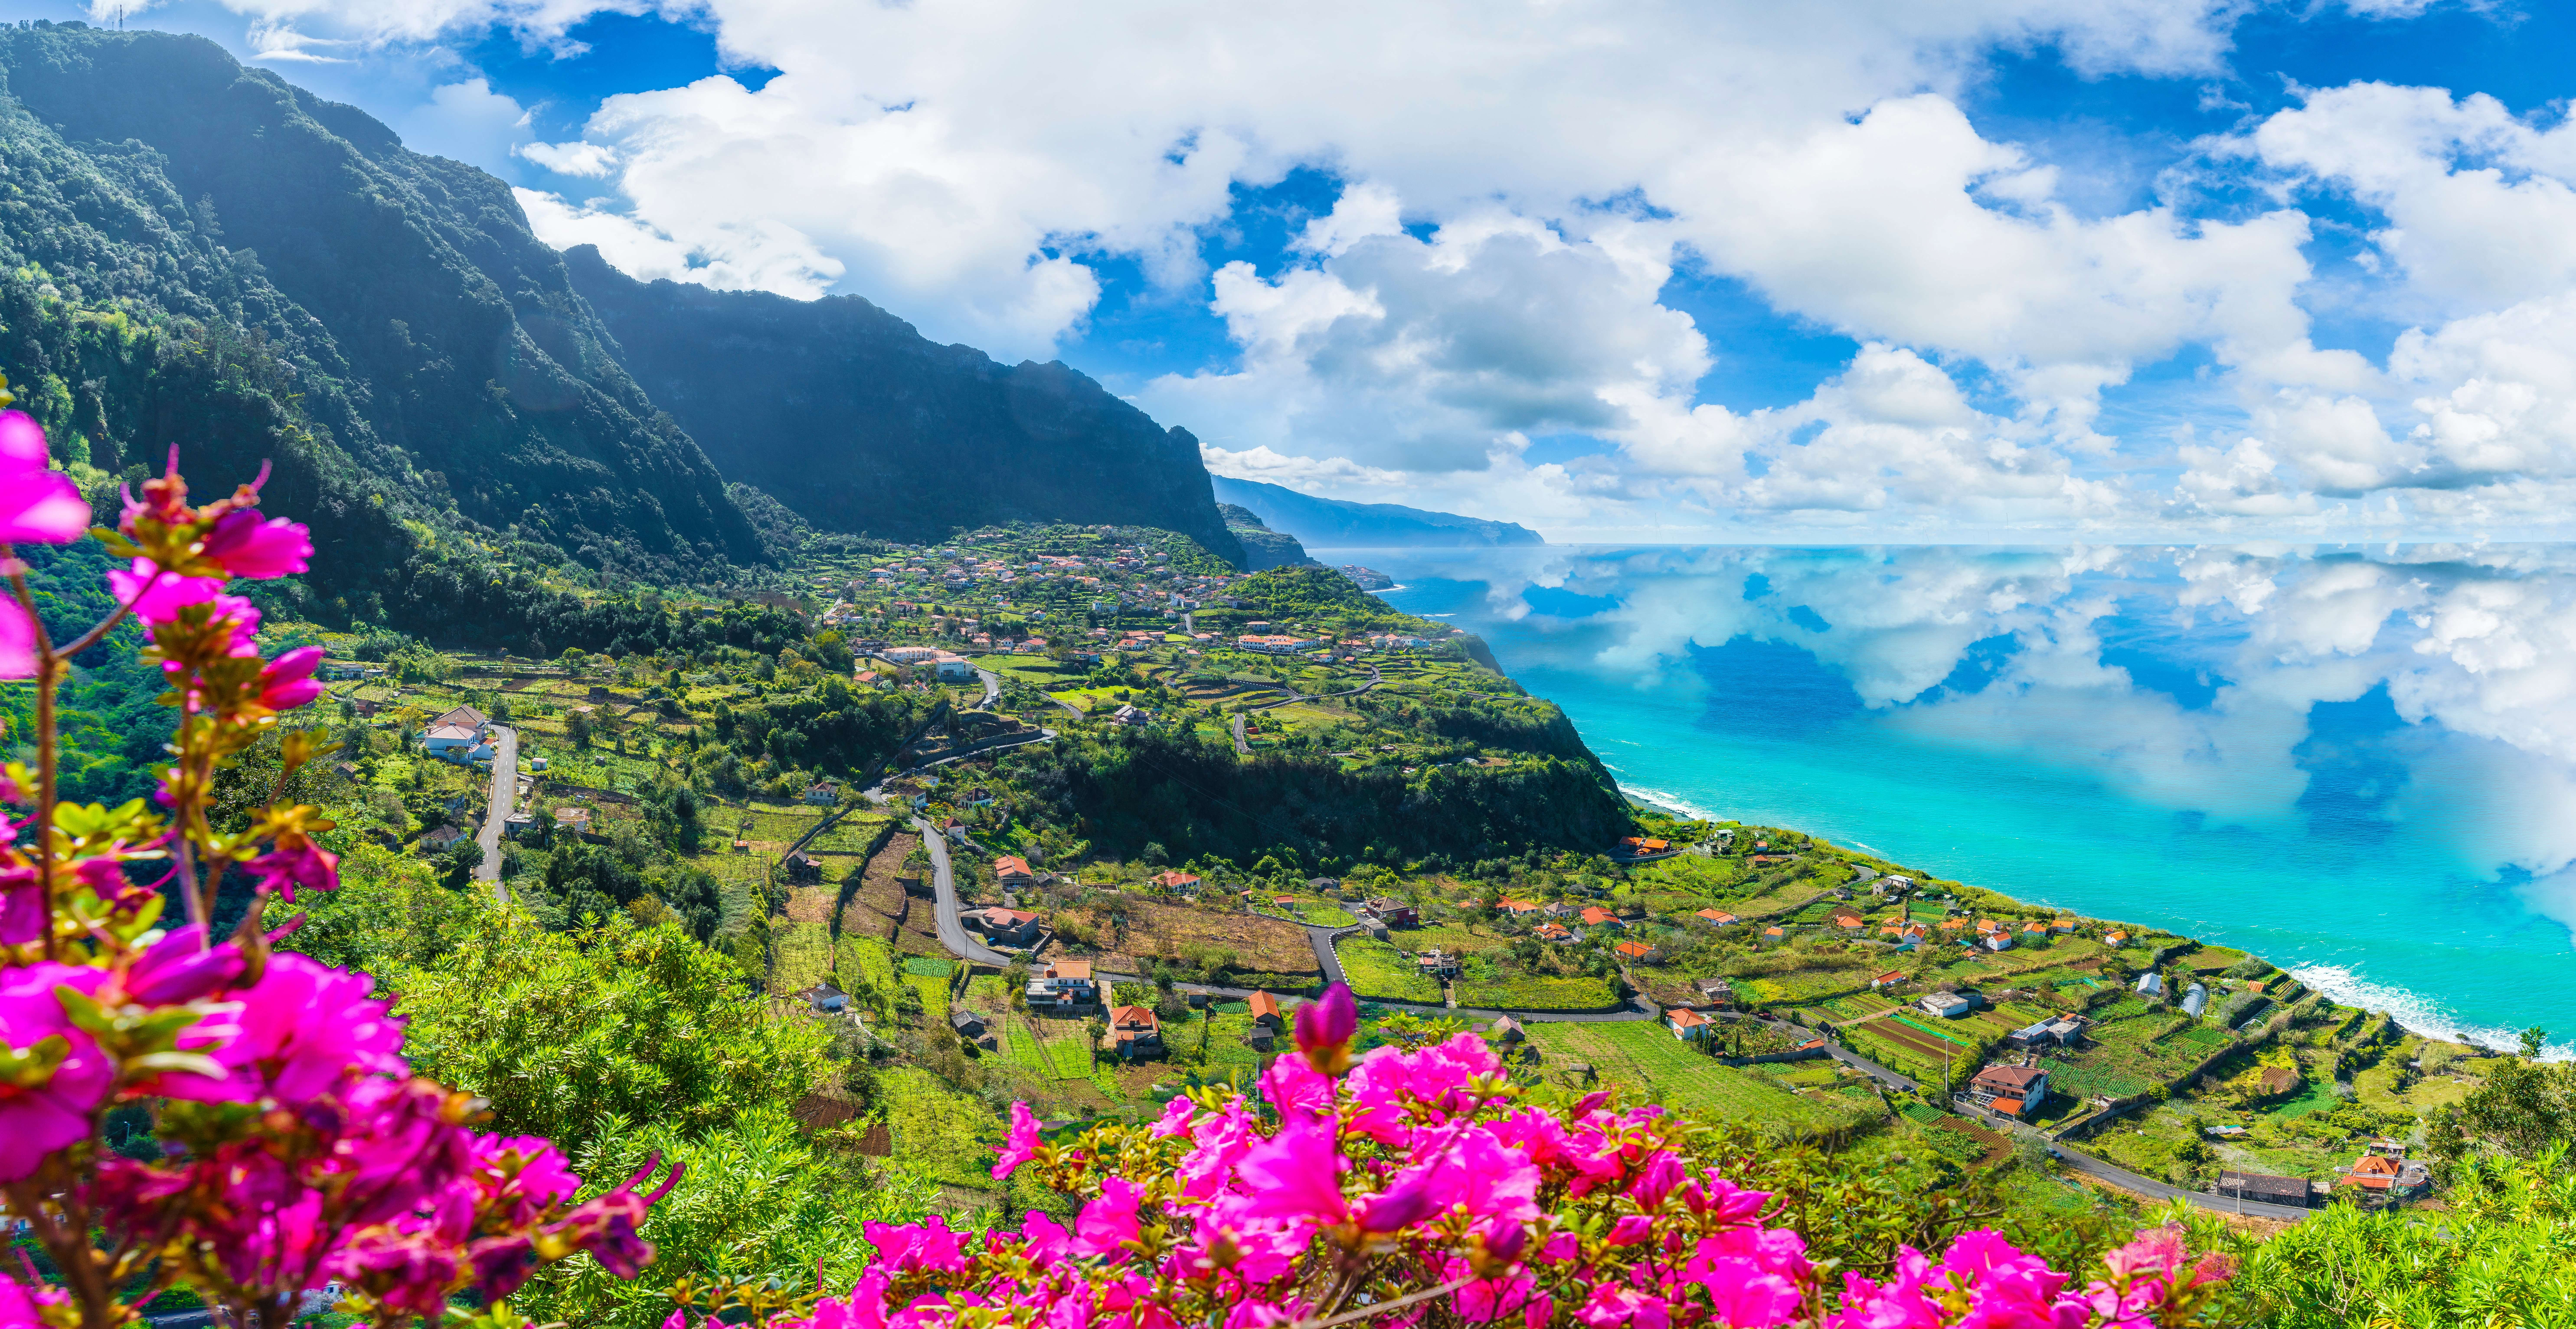 portugal walking holidays, walking holidays in portugal, Coastal and Levada Trails of Madeira, walking holiday in MAdeira, Madeira walking holiday